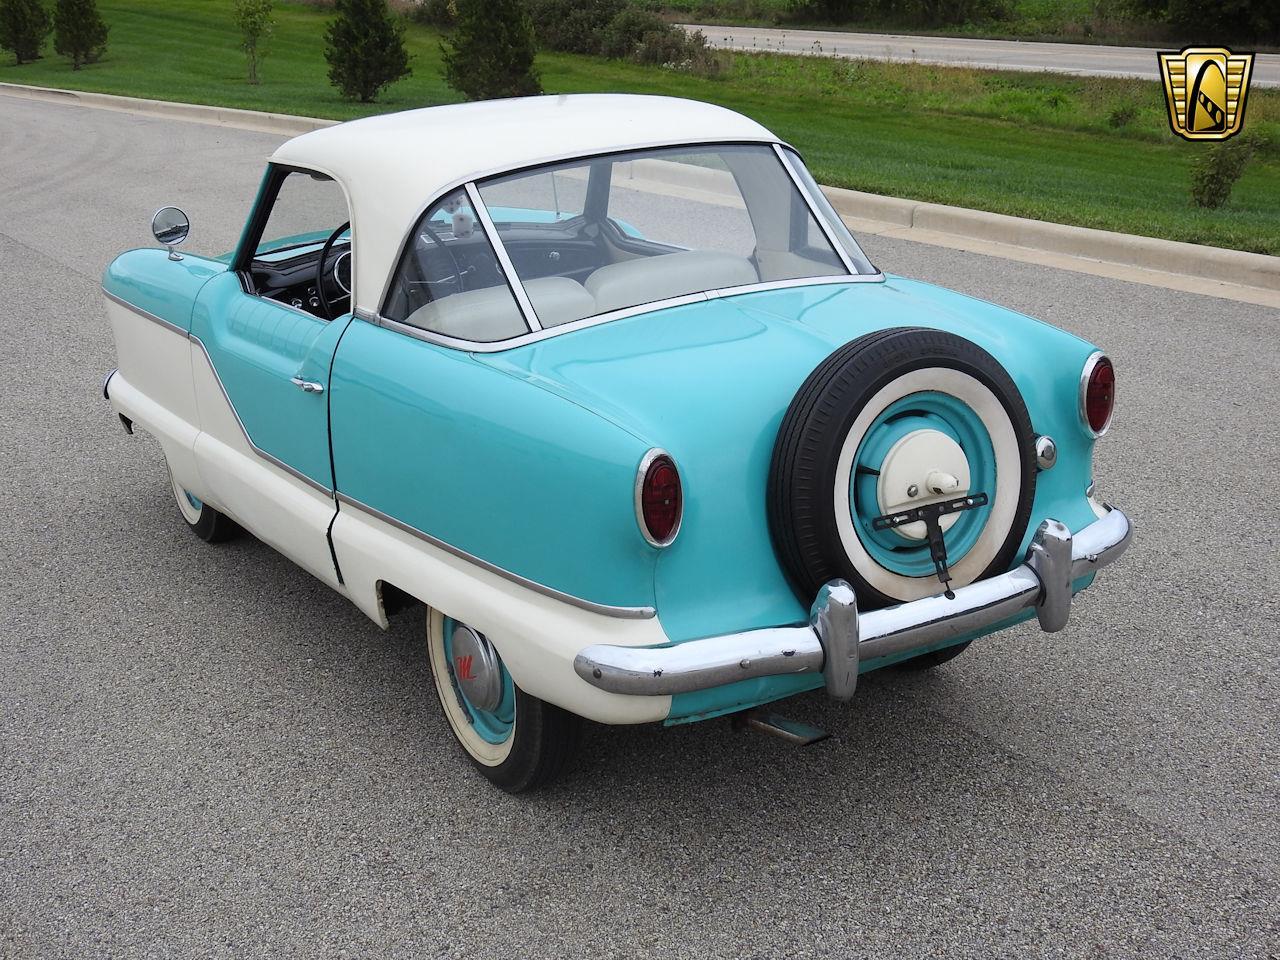 Large Picture of Classic 1957 Metropolitan located in Kenosha Wisconsin - $12,995.00 - OOM4